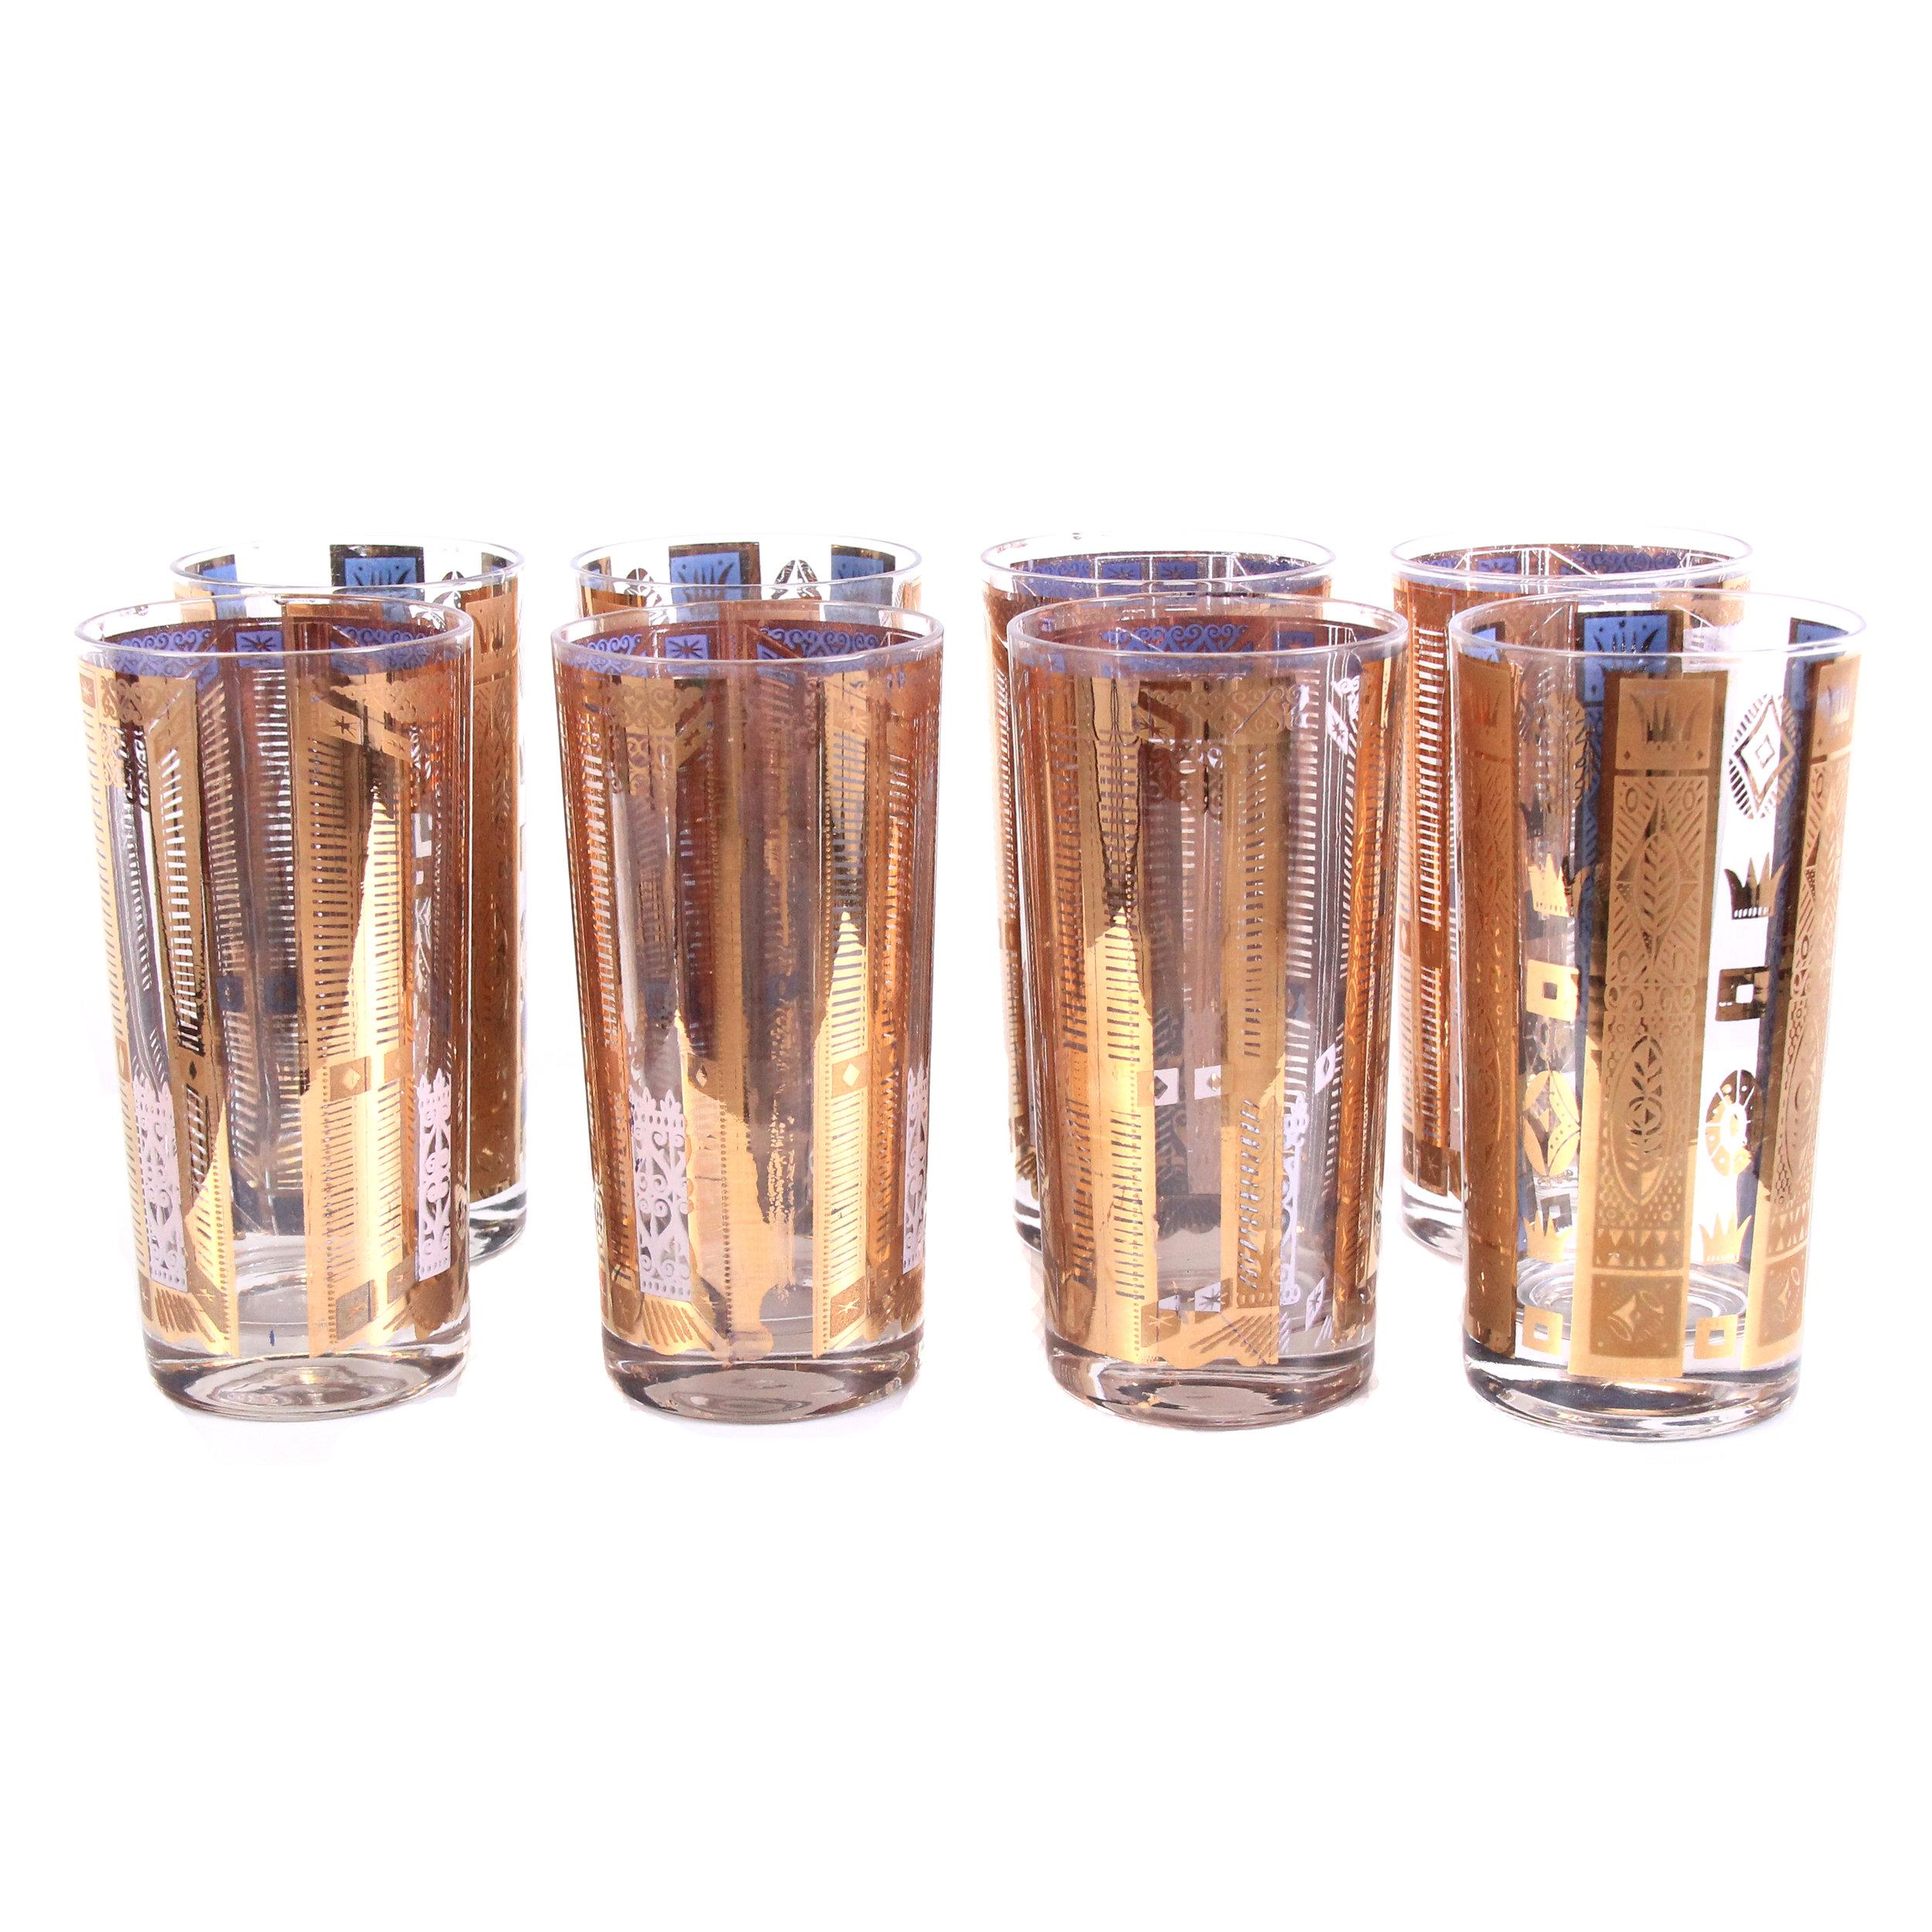 Vintage Mid Century Modern Glasses Barware - Set of 8